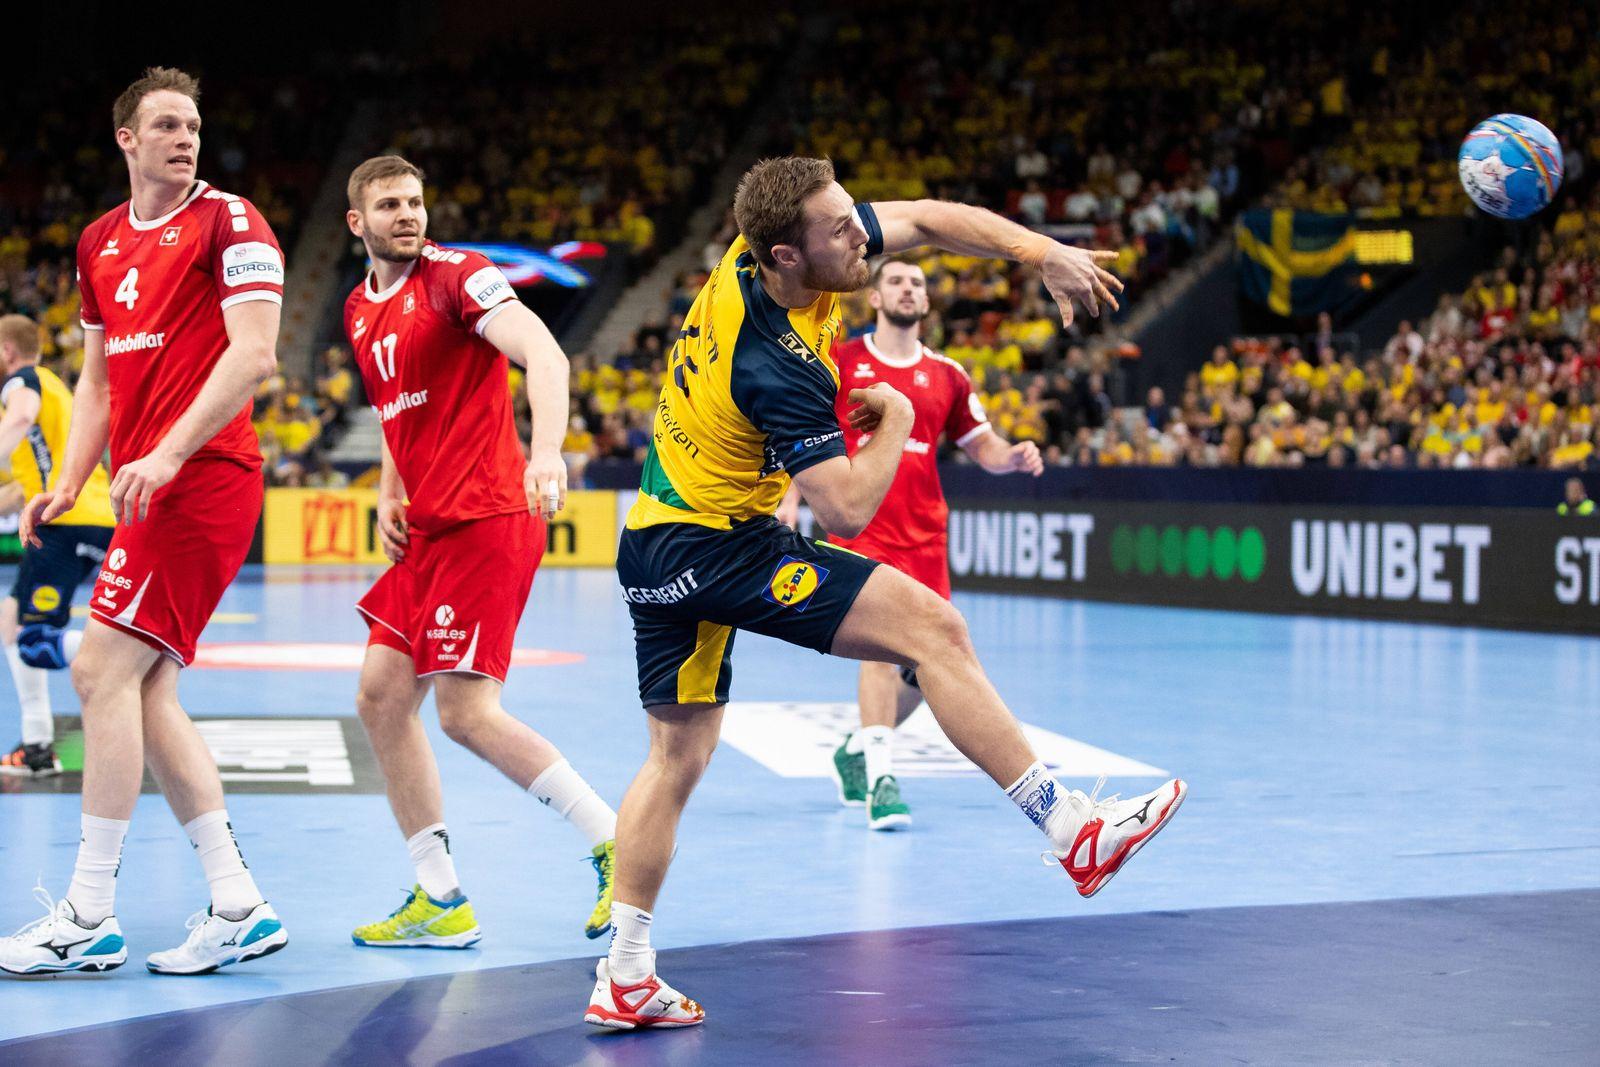 200110 Albin Lagergren of Sweden during the EHF European Handball Championship match between Sweden and Switzerland on